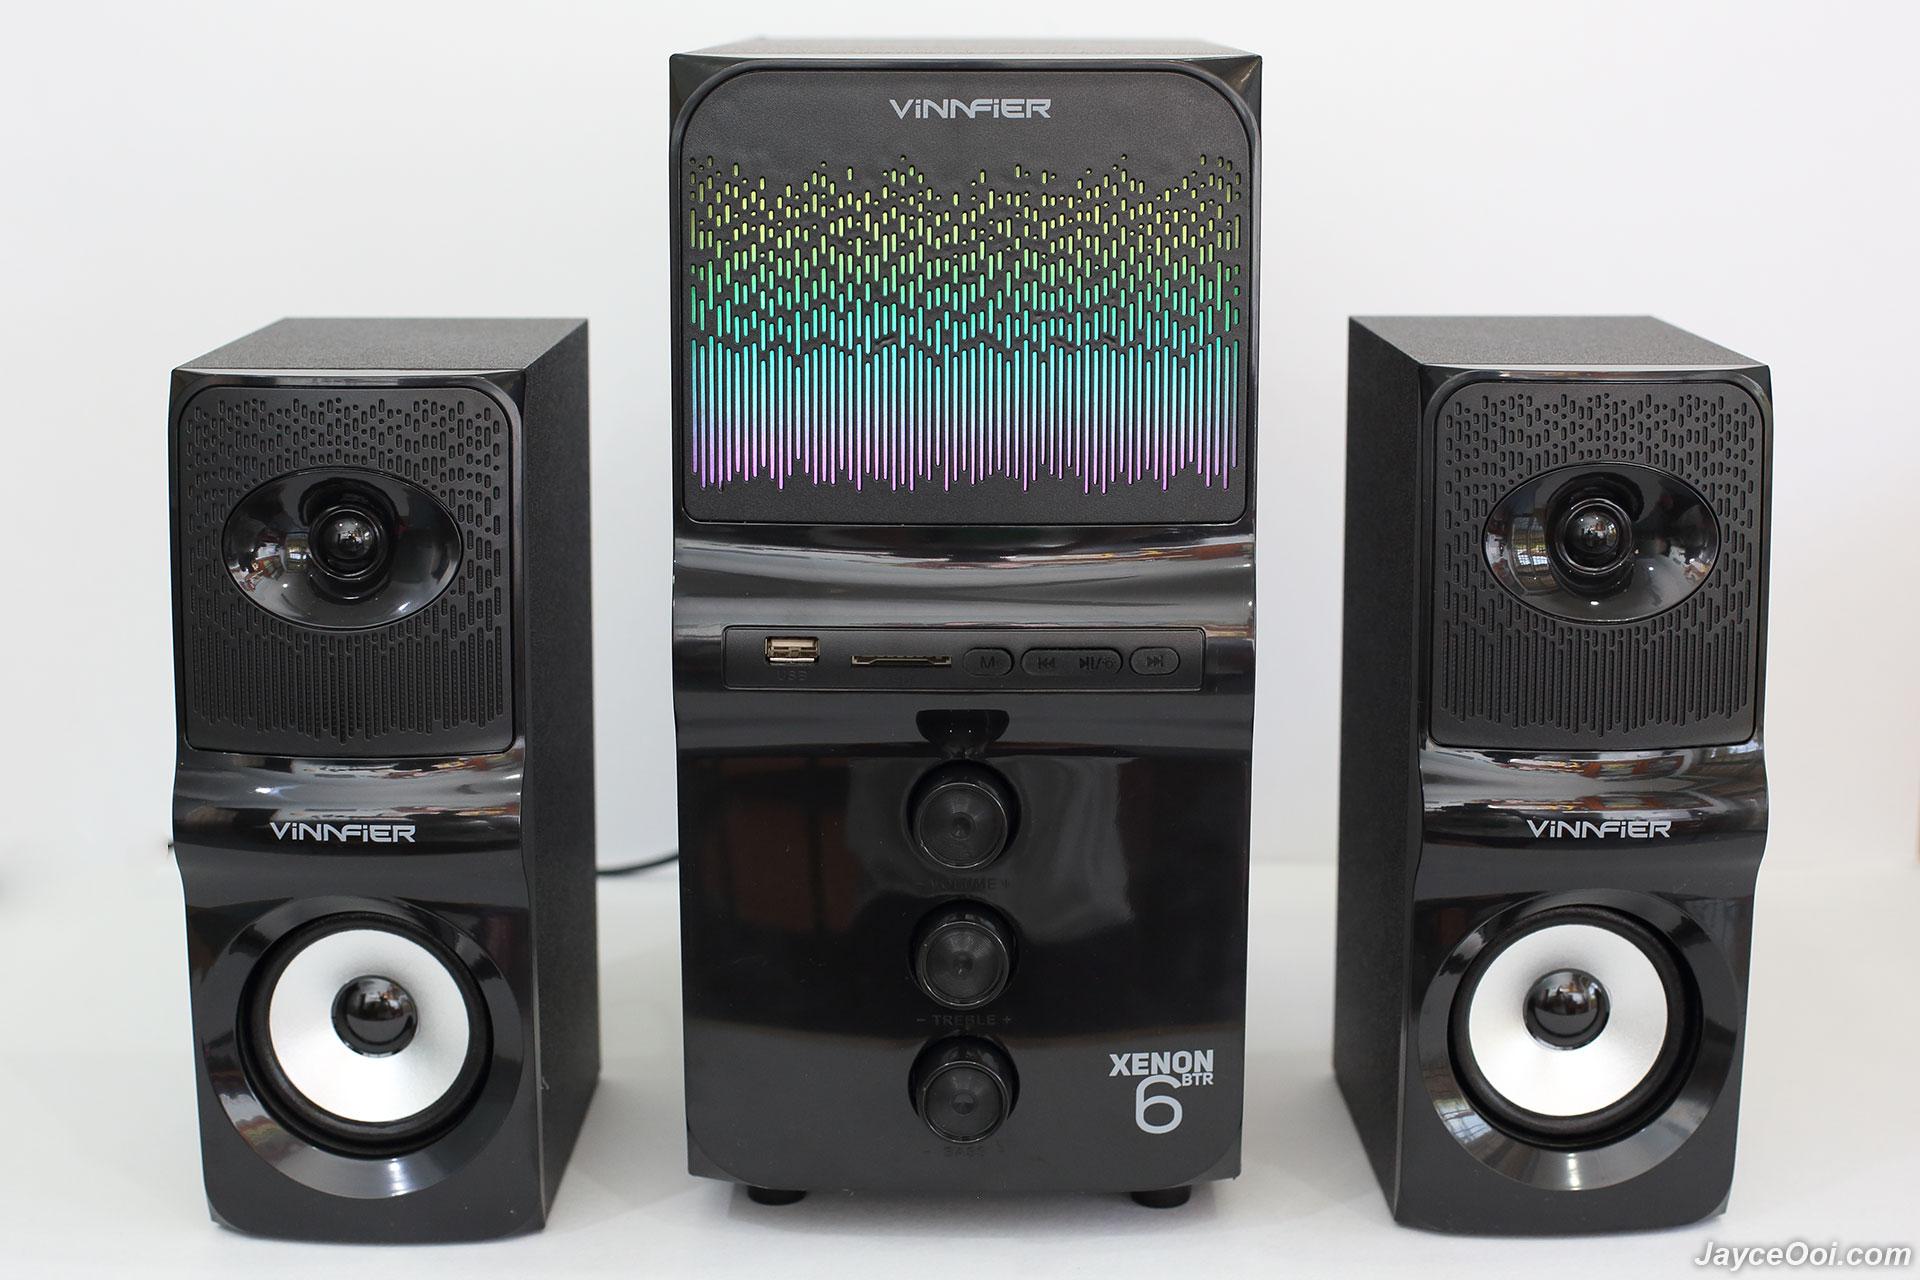 Vinnfier Xenon 6 Btr Review Sonicgear Quatro V Usb Powered 21 Multimedia Computer Pc Speaker Alright